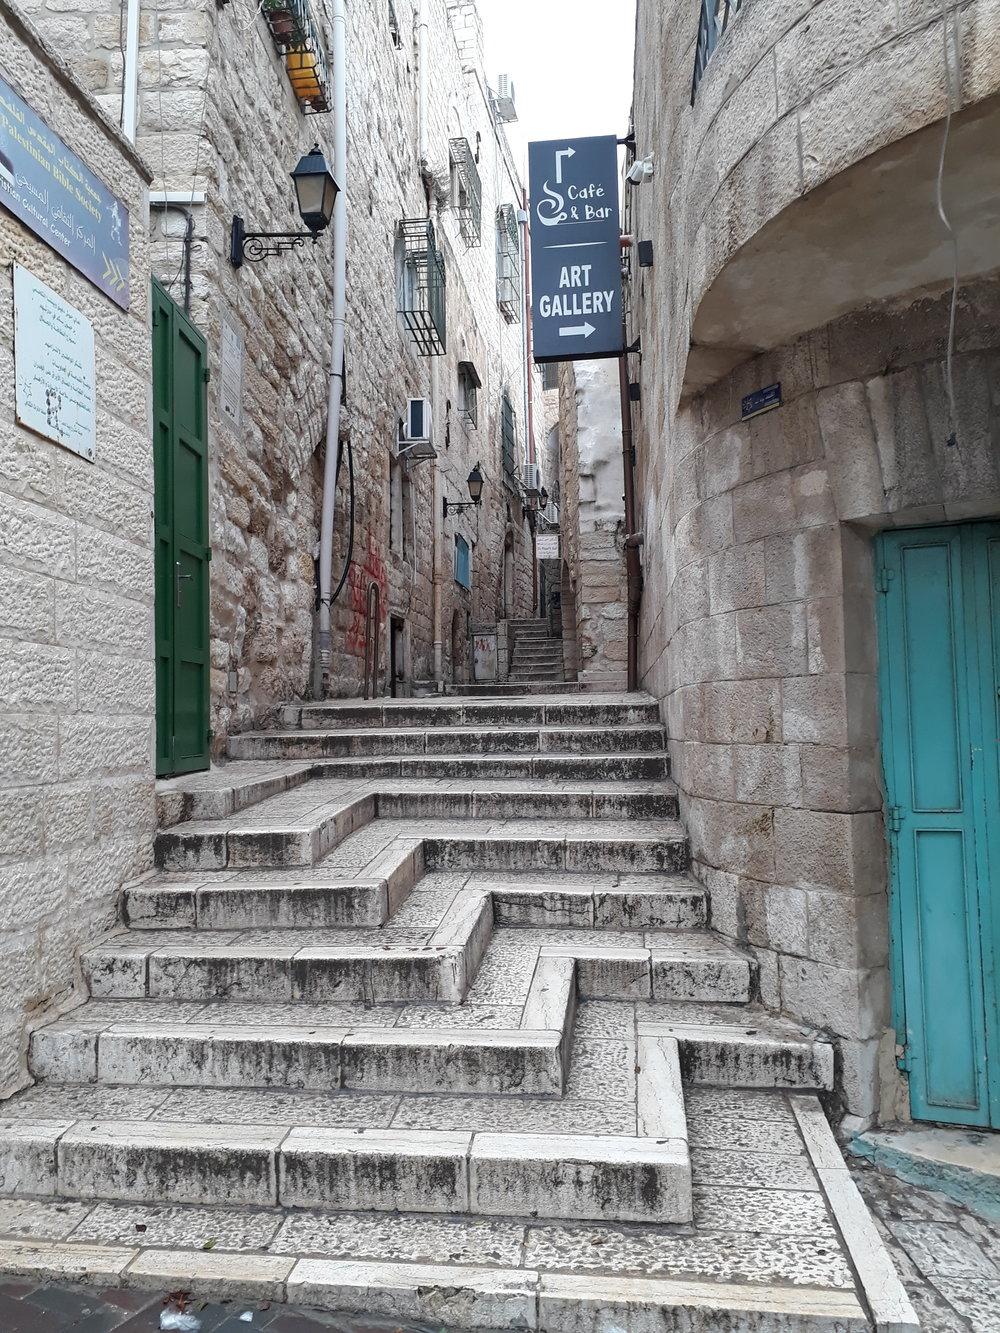 Streets of historic Bethlehem